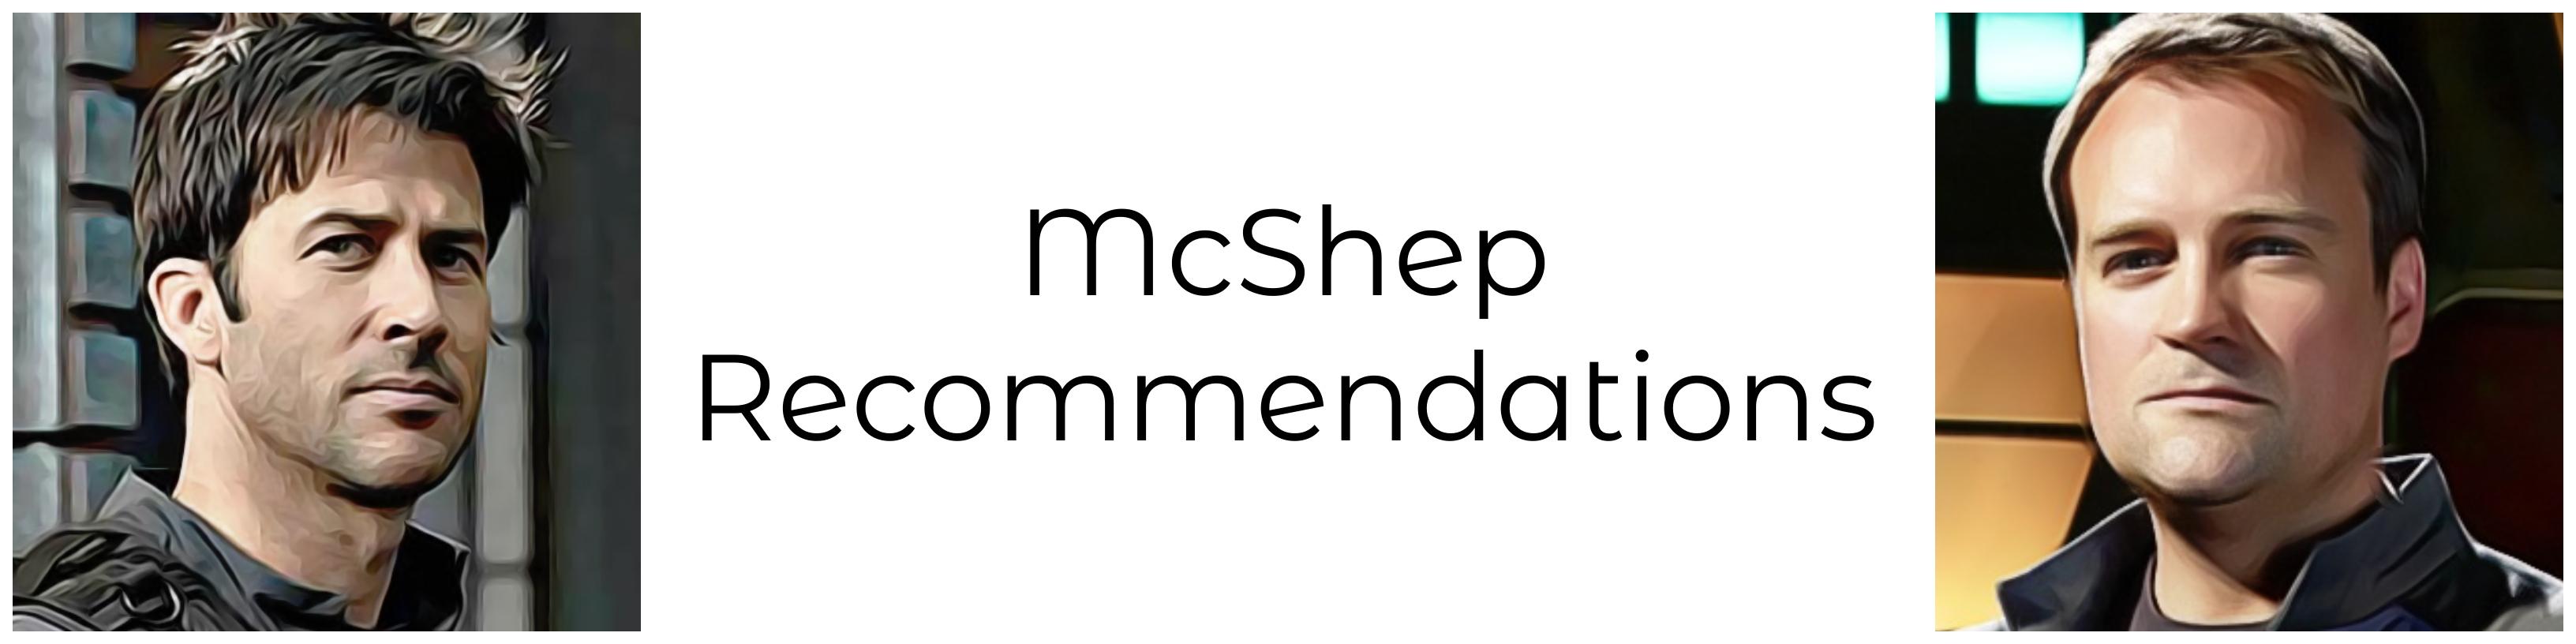 McShep Banner